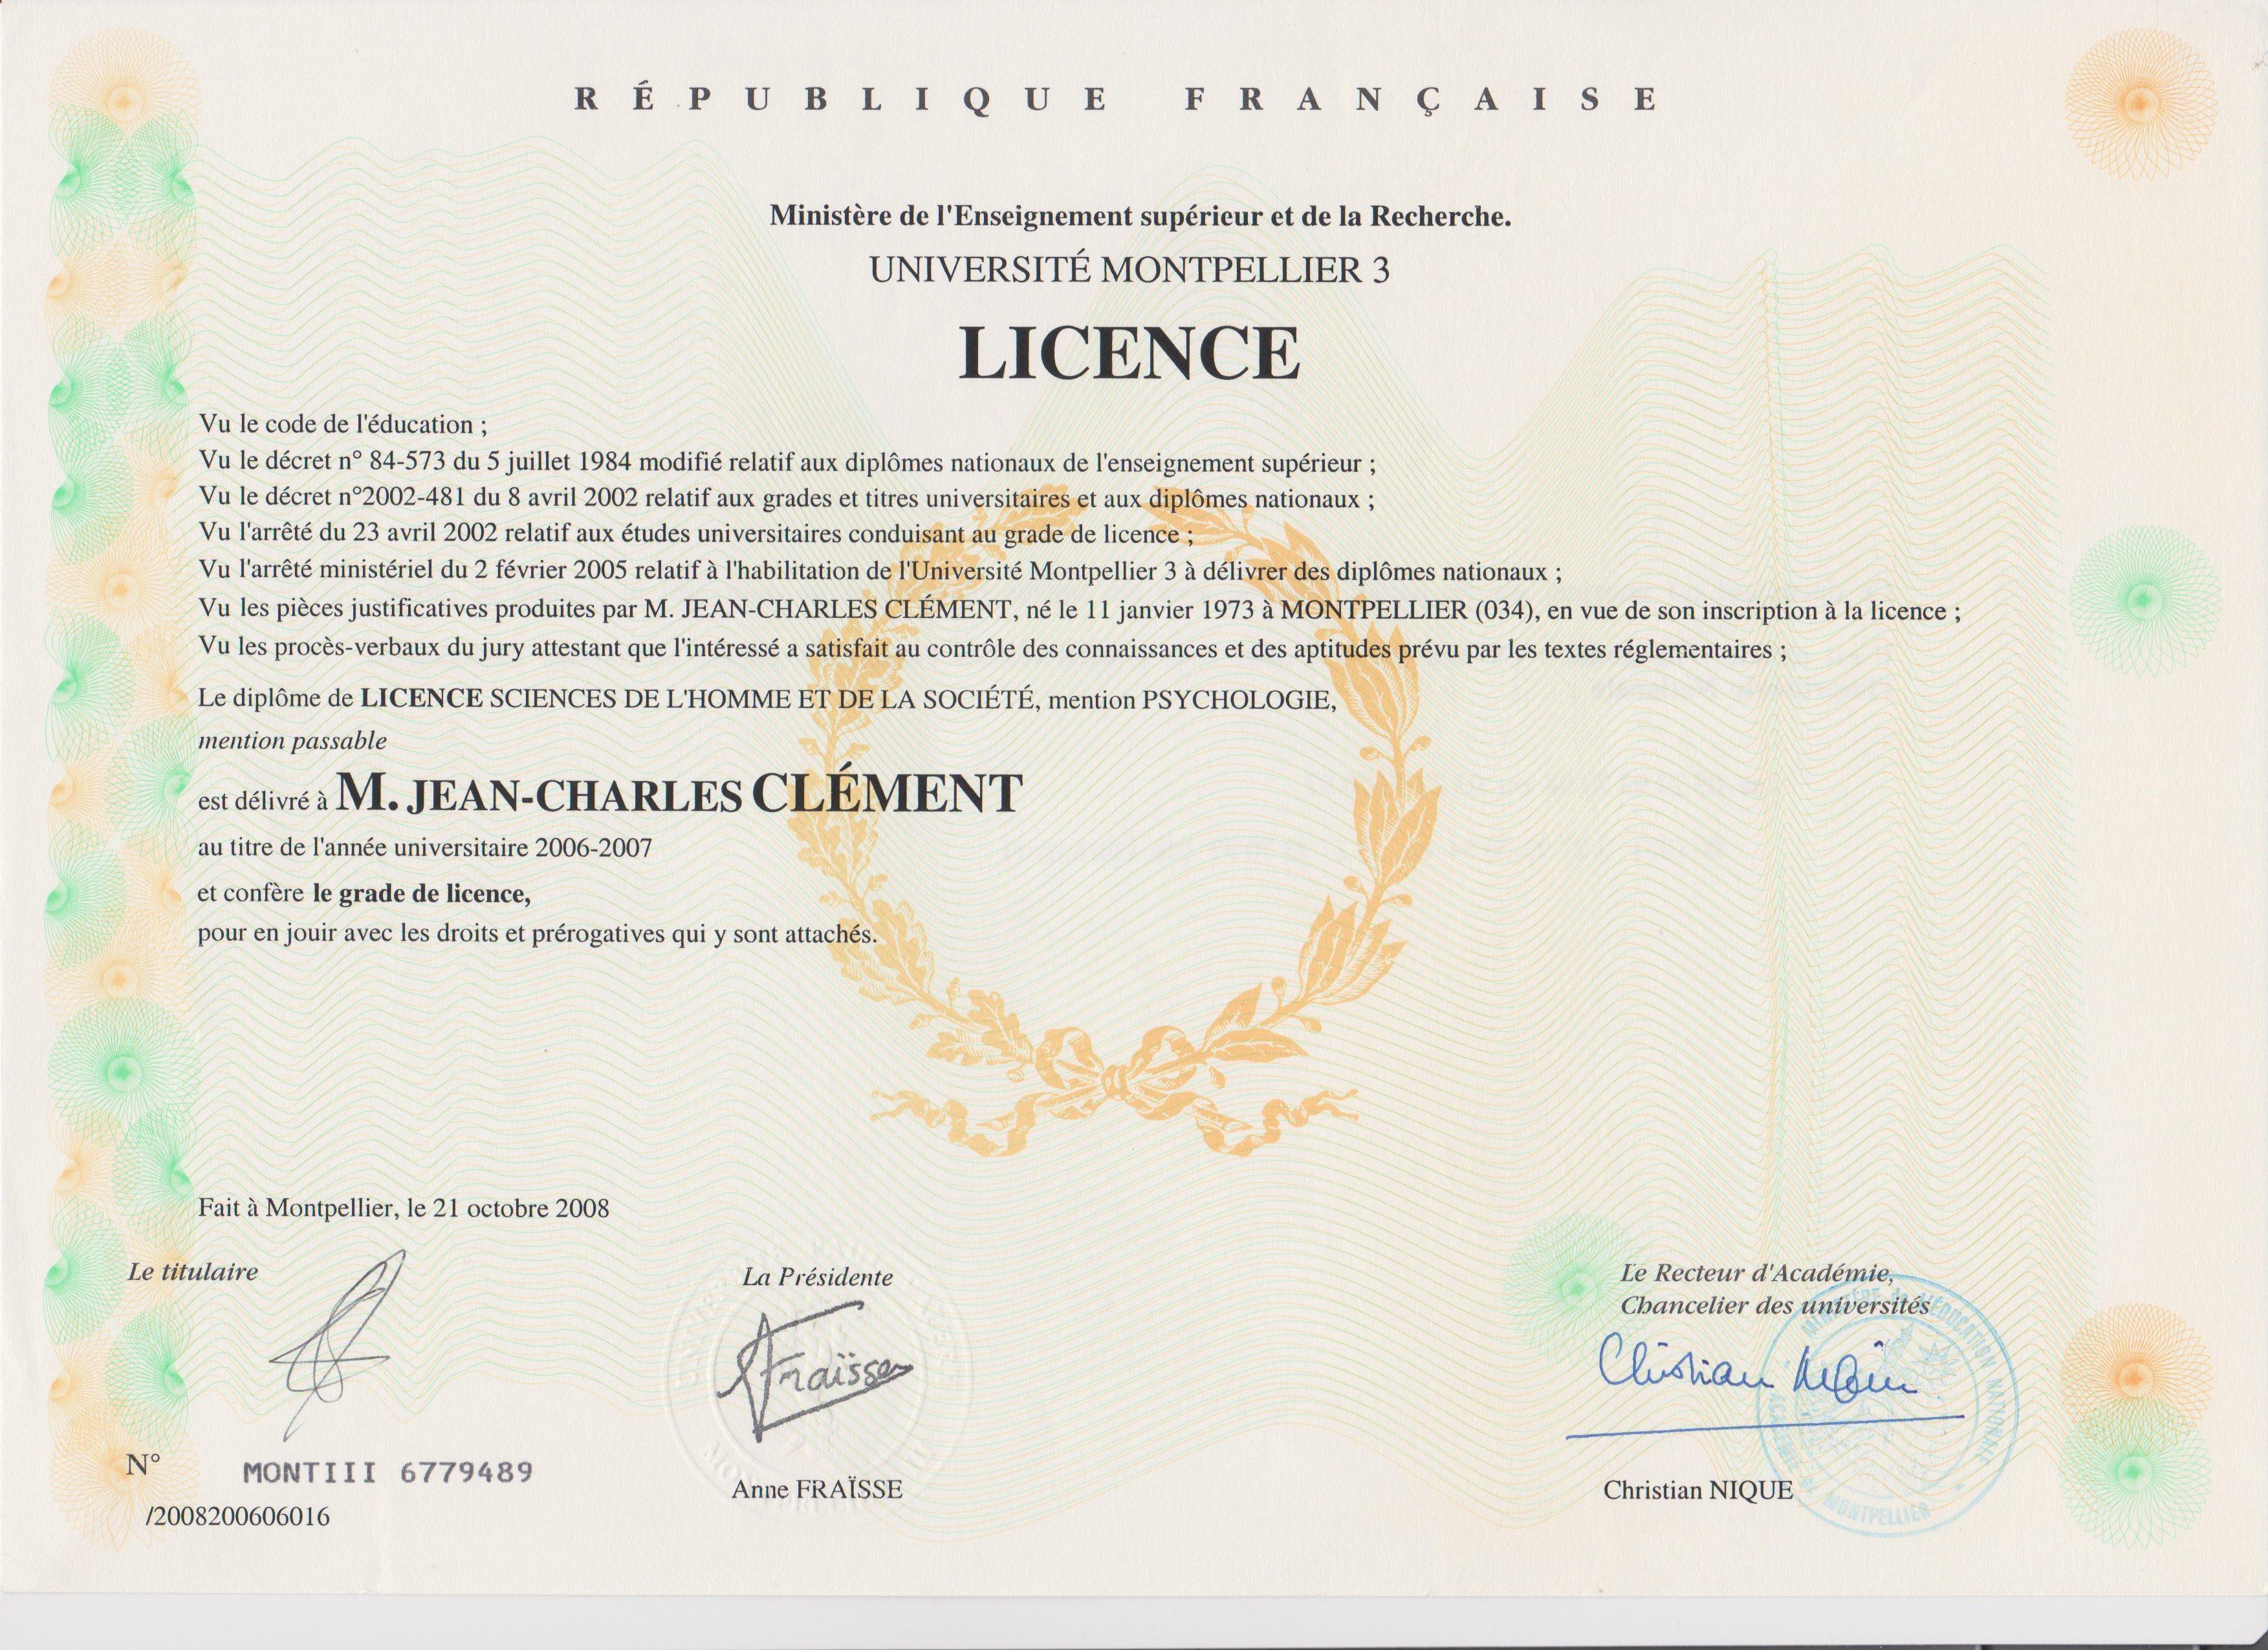 diplome de licence